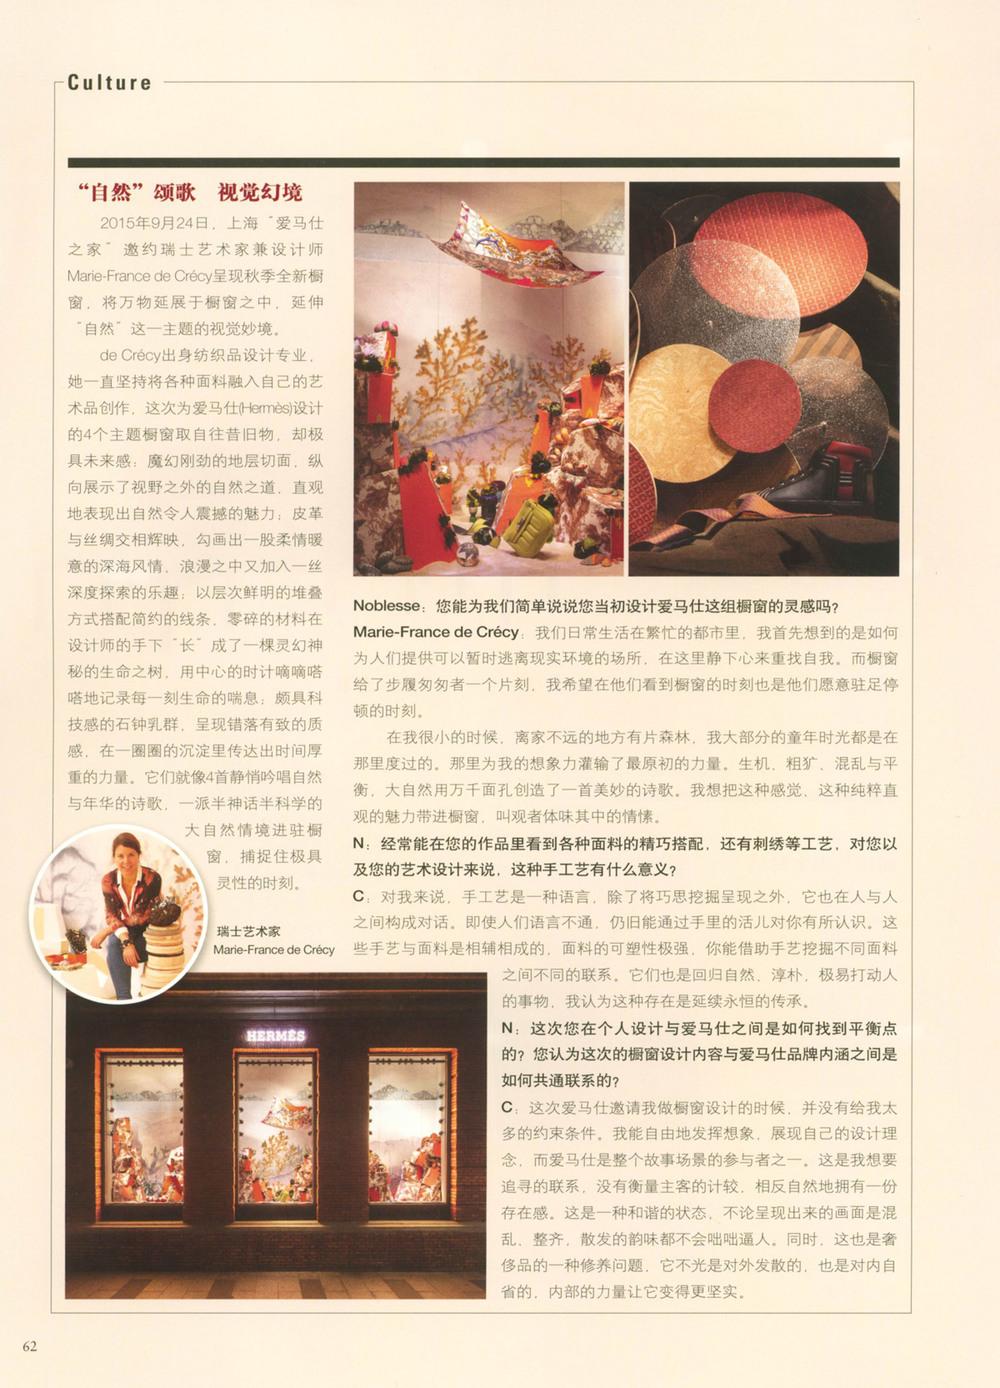 China-Noblesse(望)-November-P62-1-2.jpg